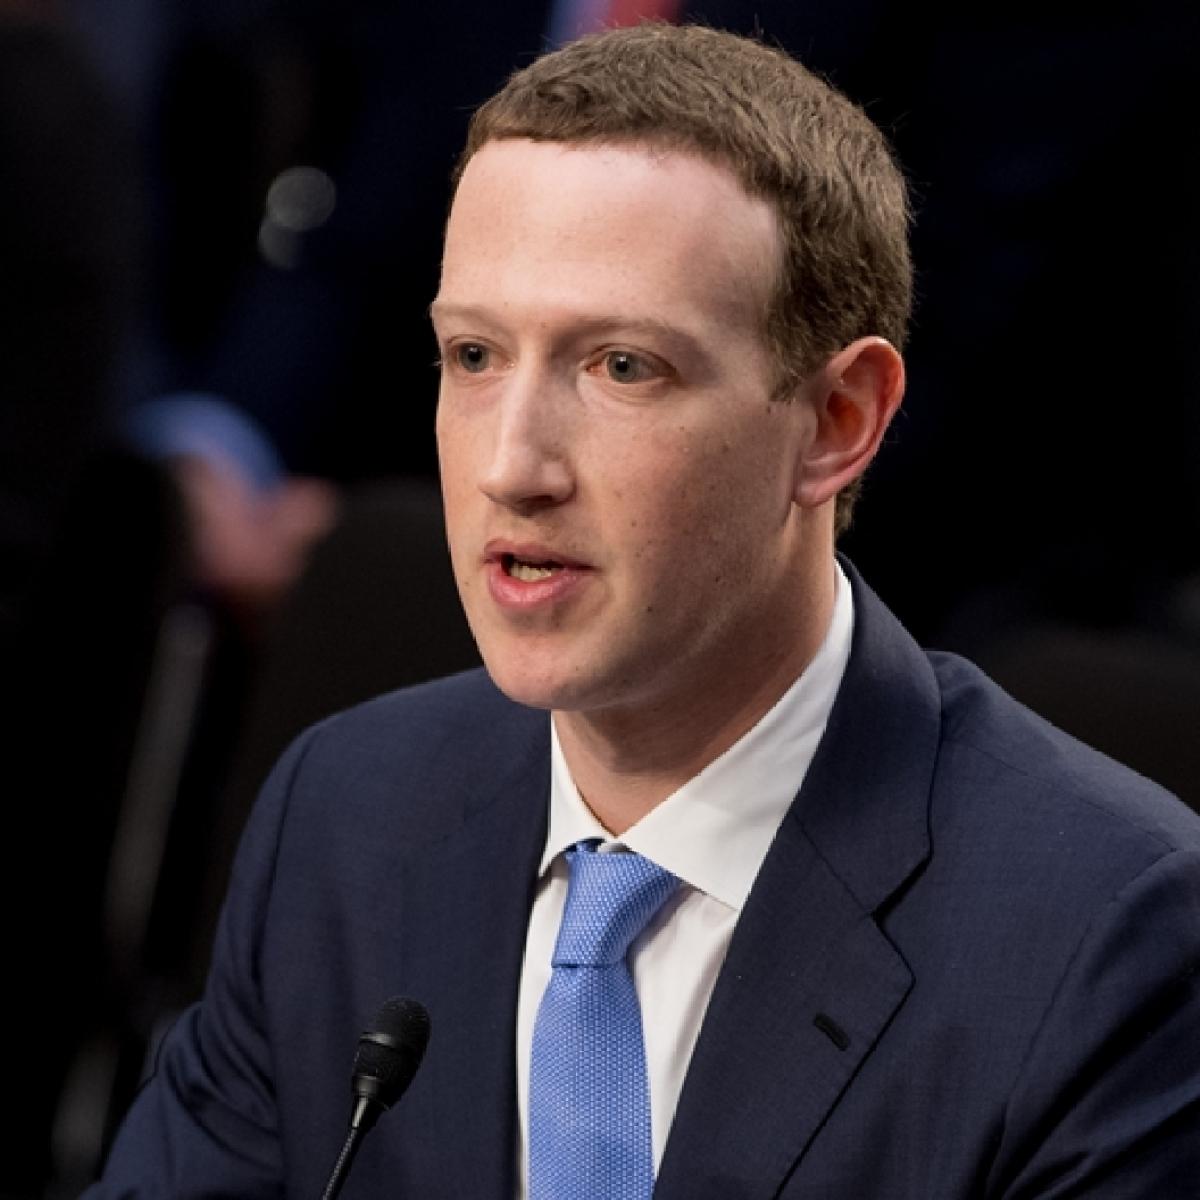 Fix Facebook before launching Libra: Lawmakers to Zuckerberg